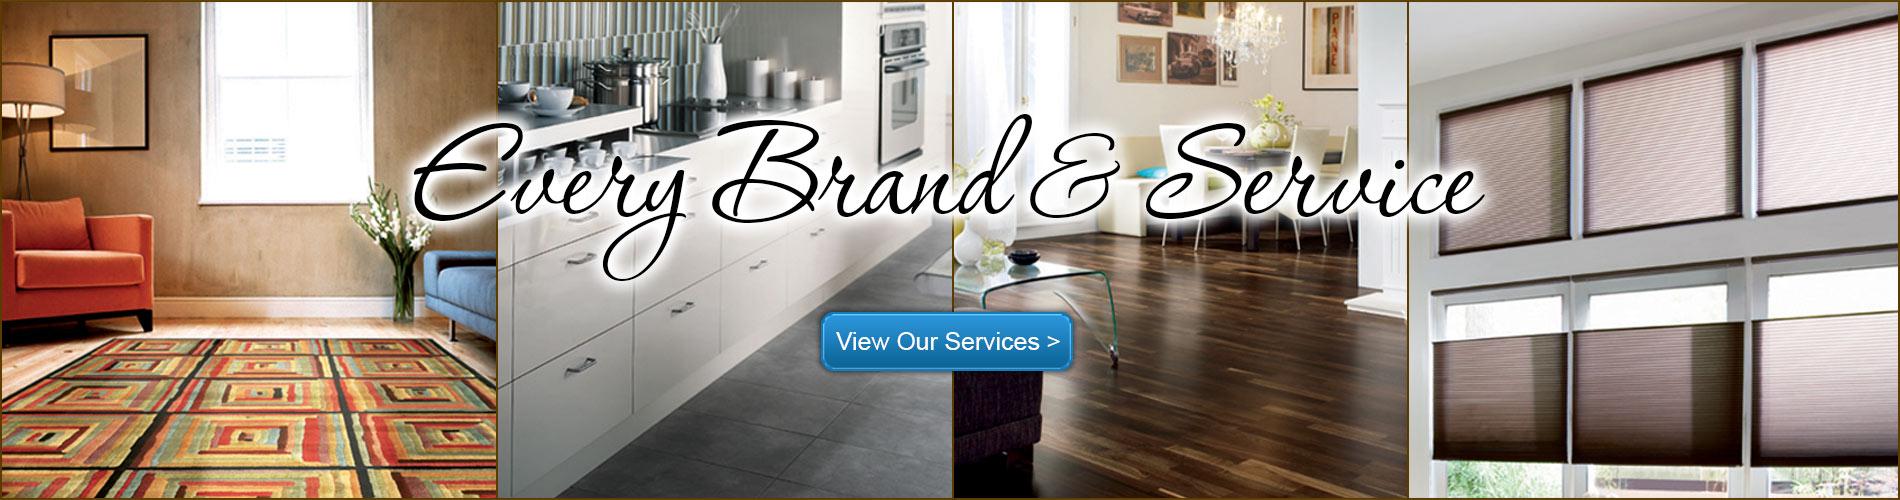 Every Brand & Service